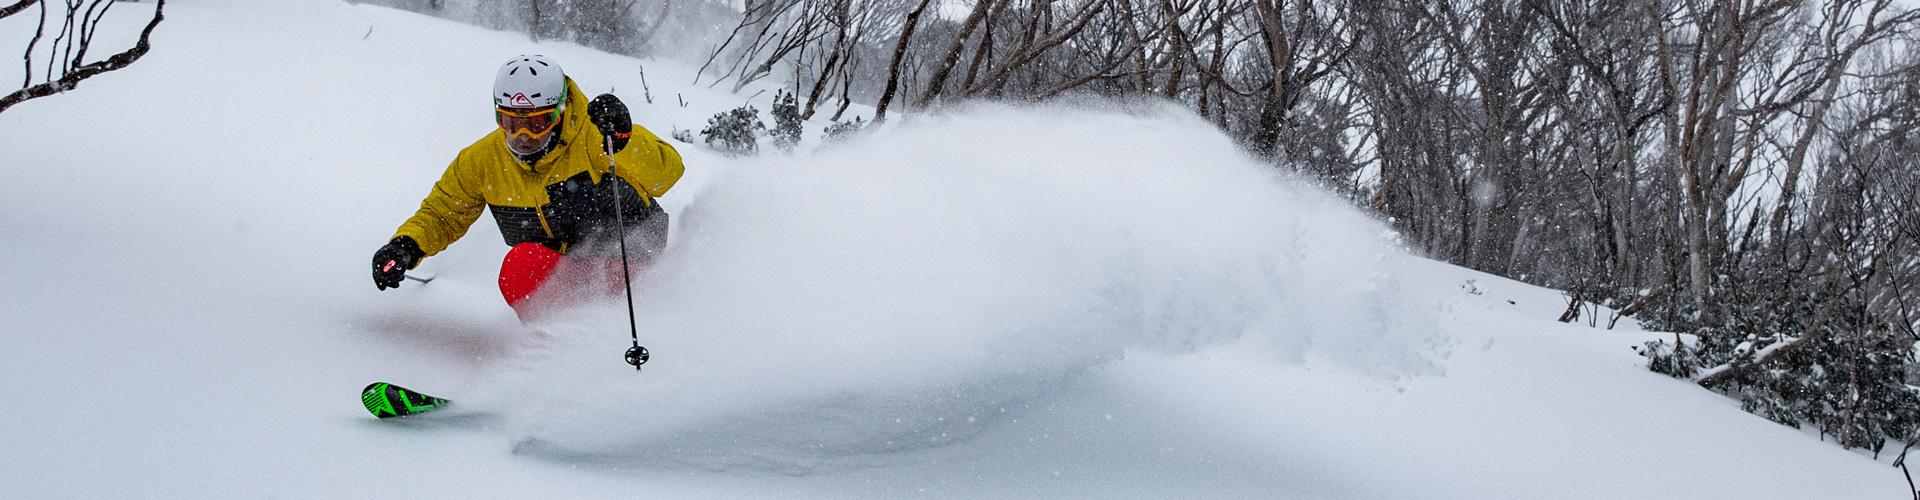 snow boarding hotham